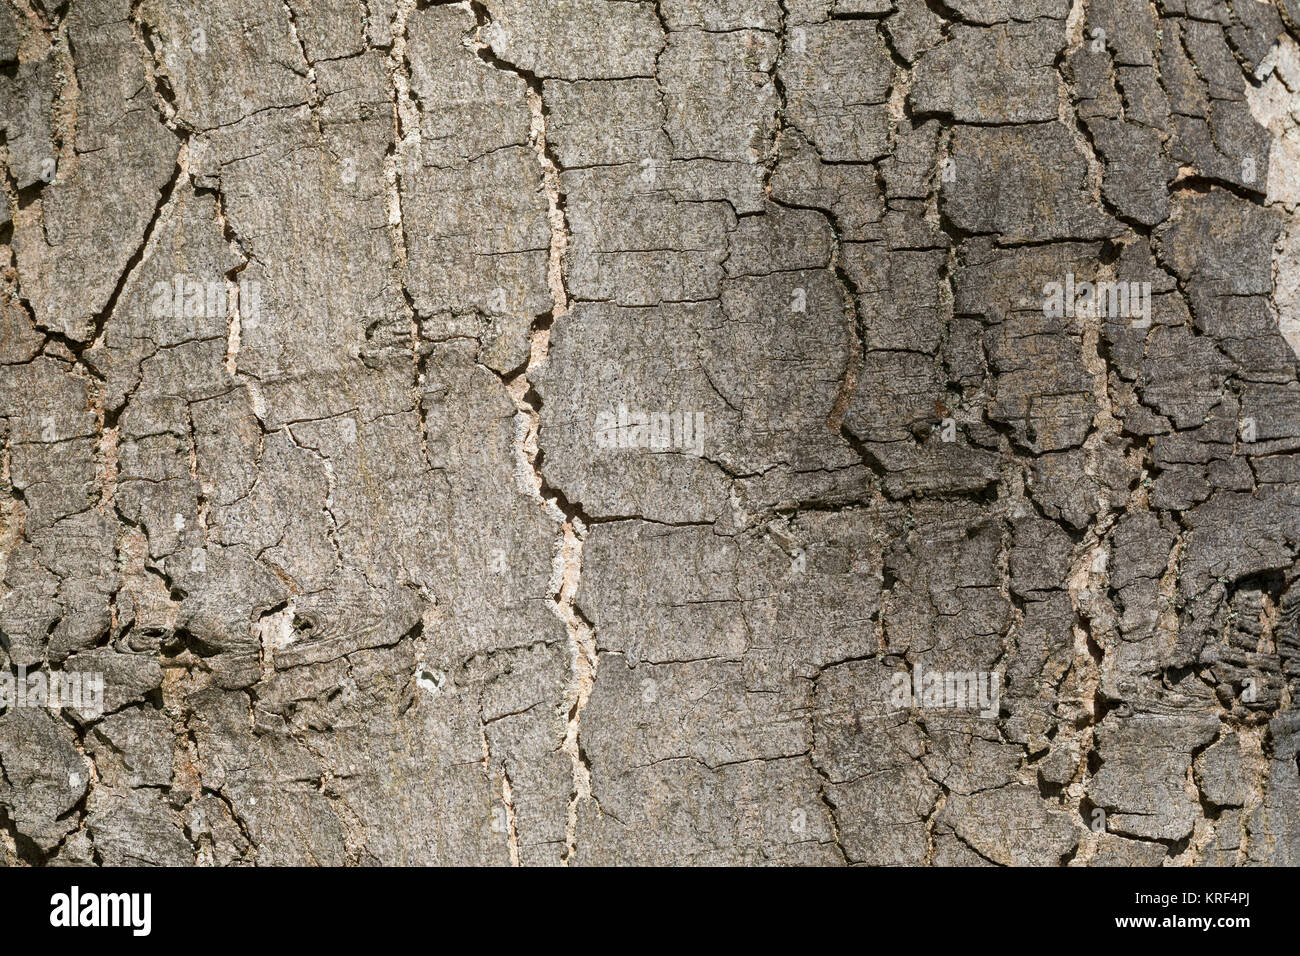 Berg-Ahorn, Bergahorn, Rinde, Borke, Stamm, Baumstamm, Ahorn, Acer pseudoplatanus, Sycamore, Erable sycomore, sycamore Stock Photo